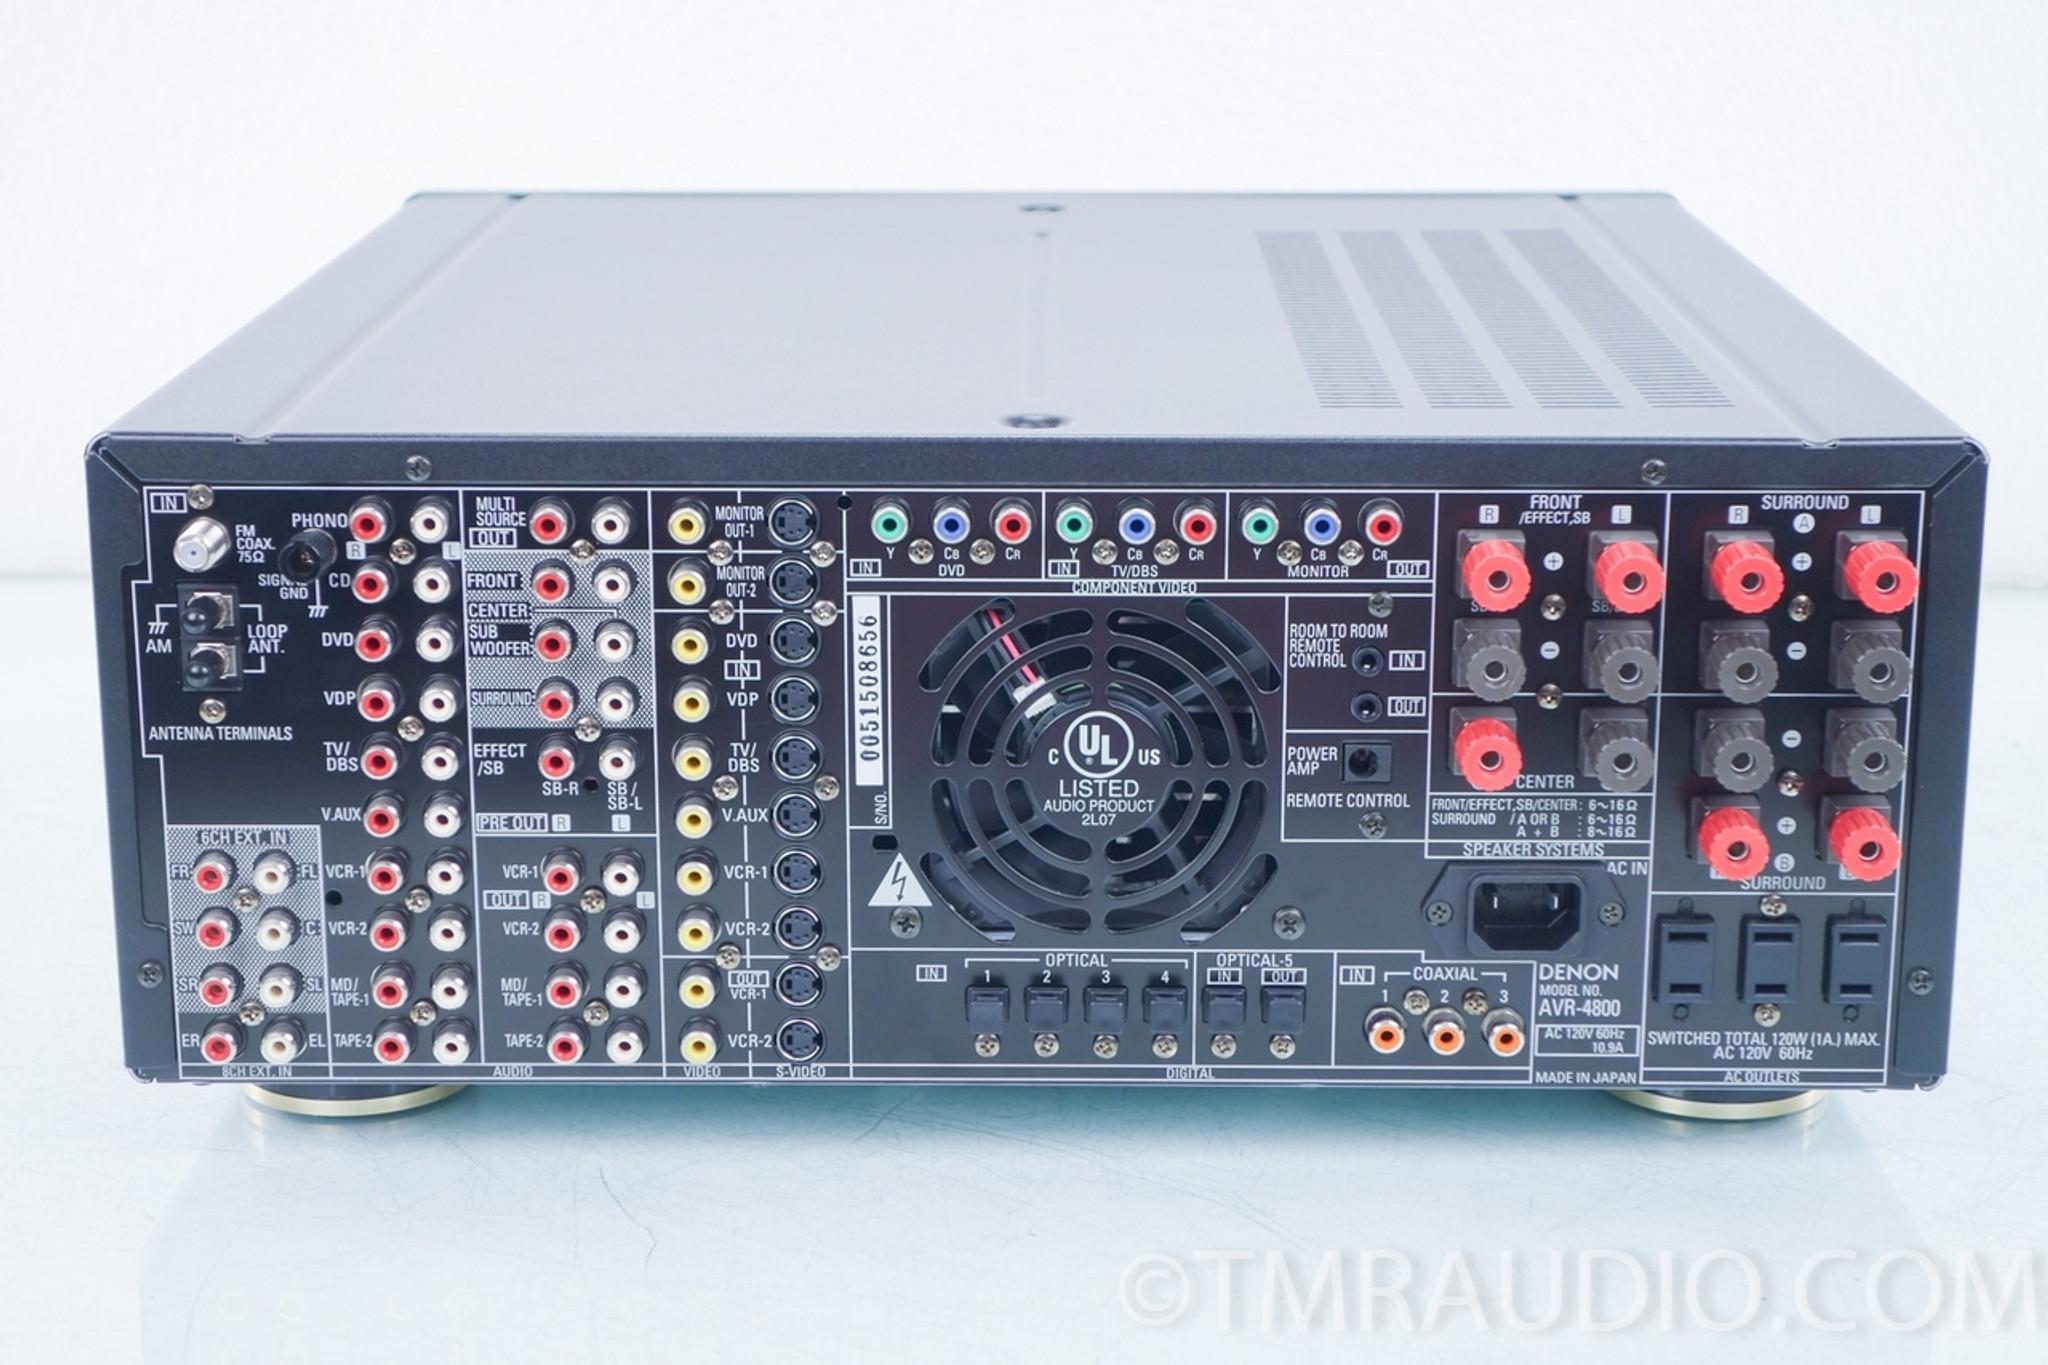 denon avr 4800 thx home theater receiver the music room rh tmraudio com Denon AVR 4311 Denon AVR 4311